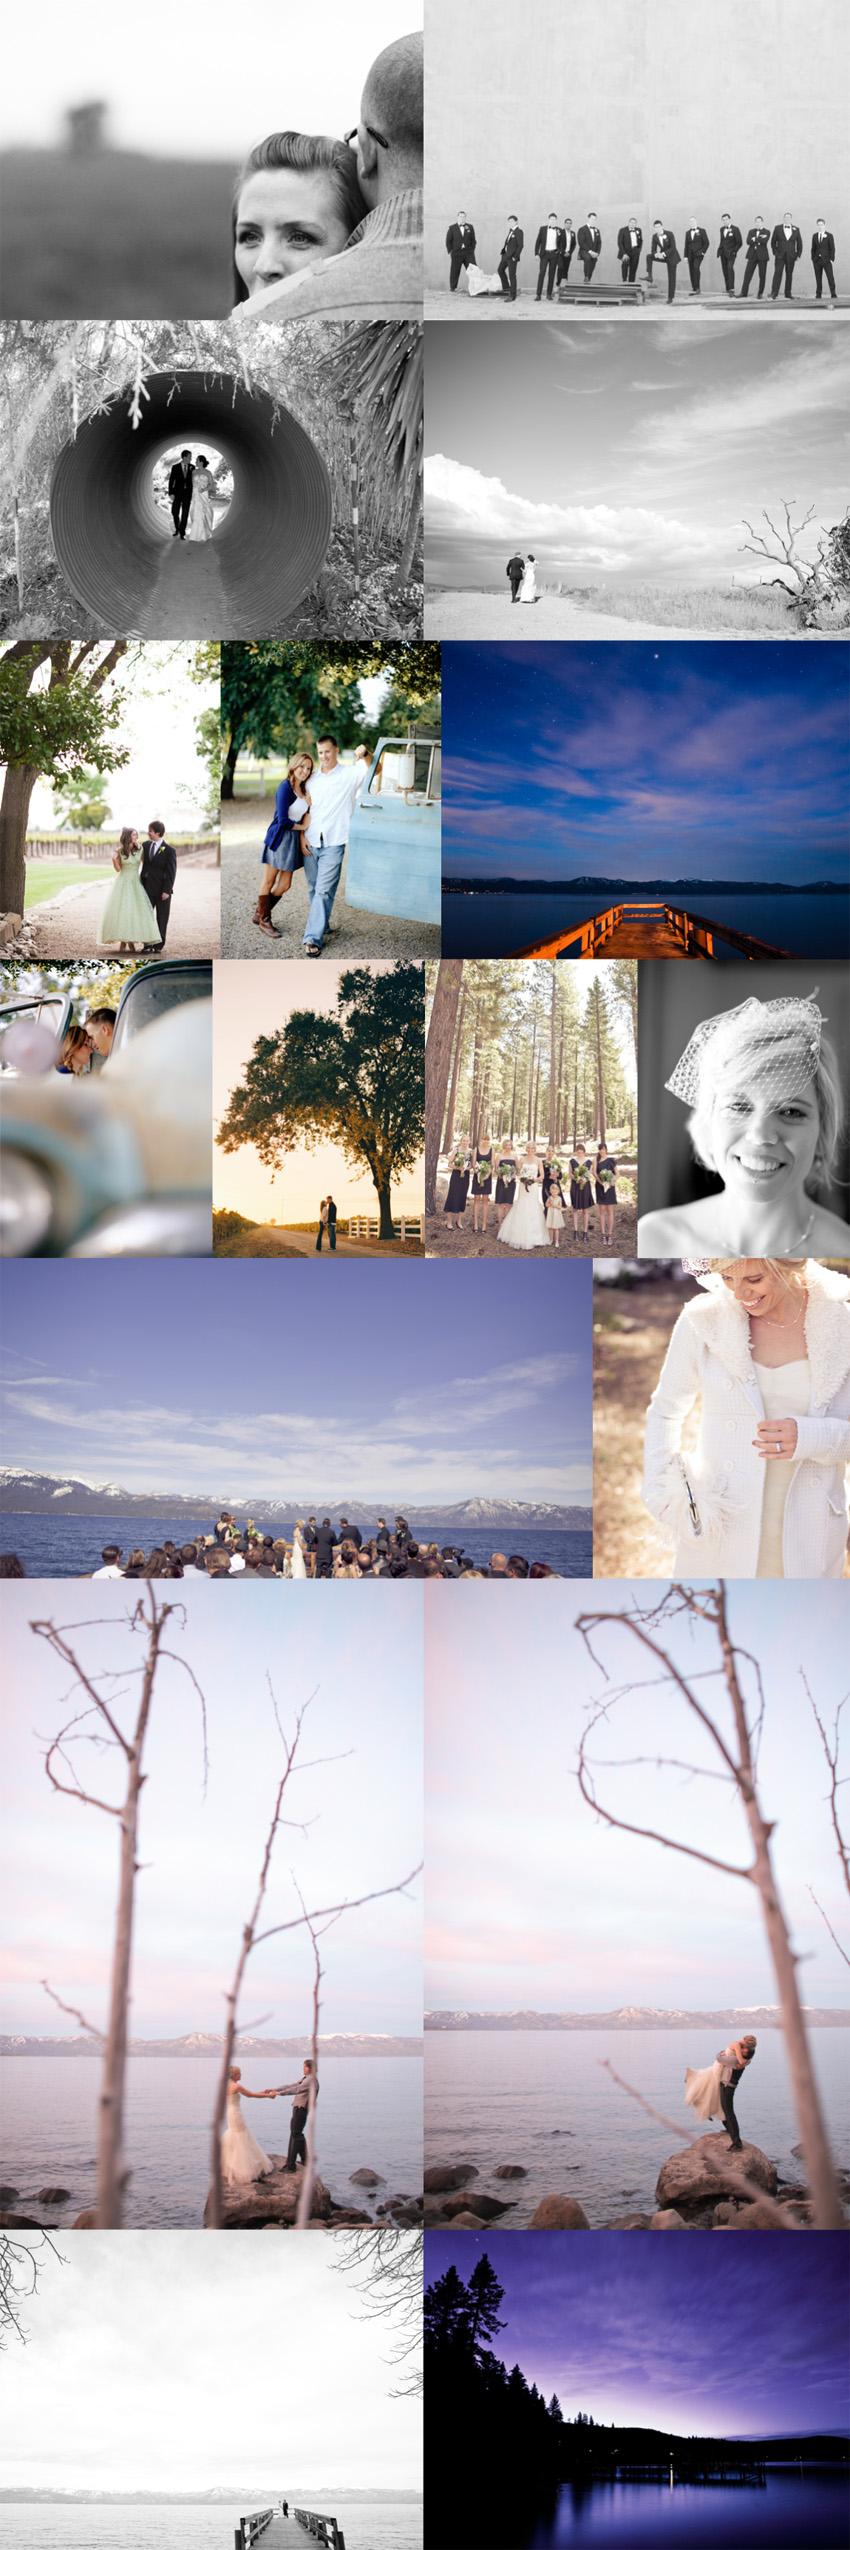 Bestof2010_ScottAndrew5 FIne art wedding photography lake tahoe